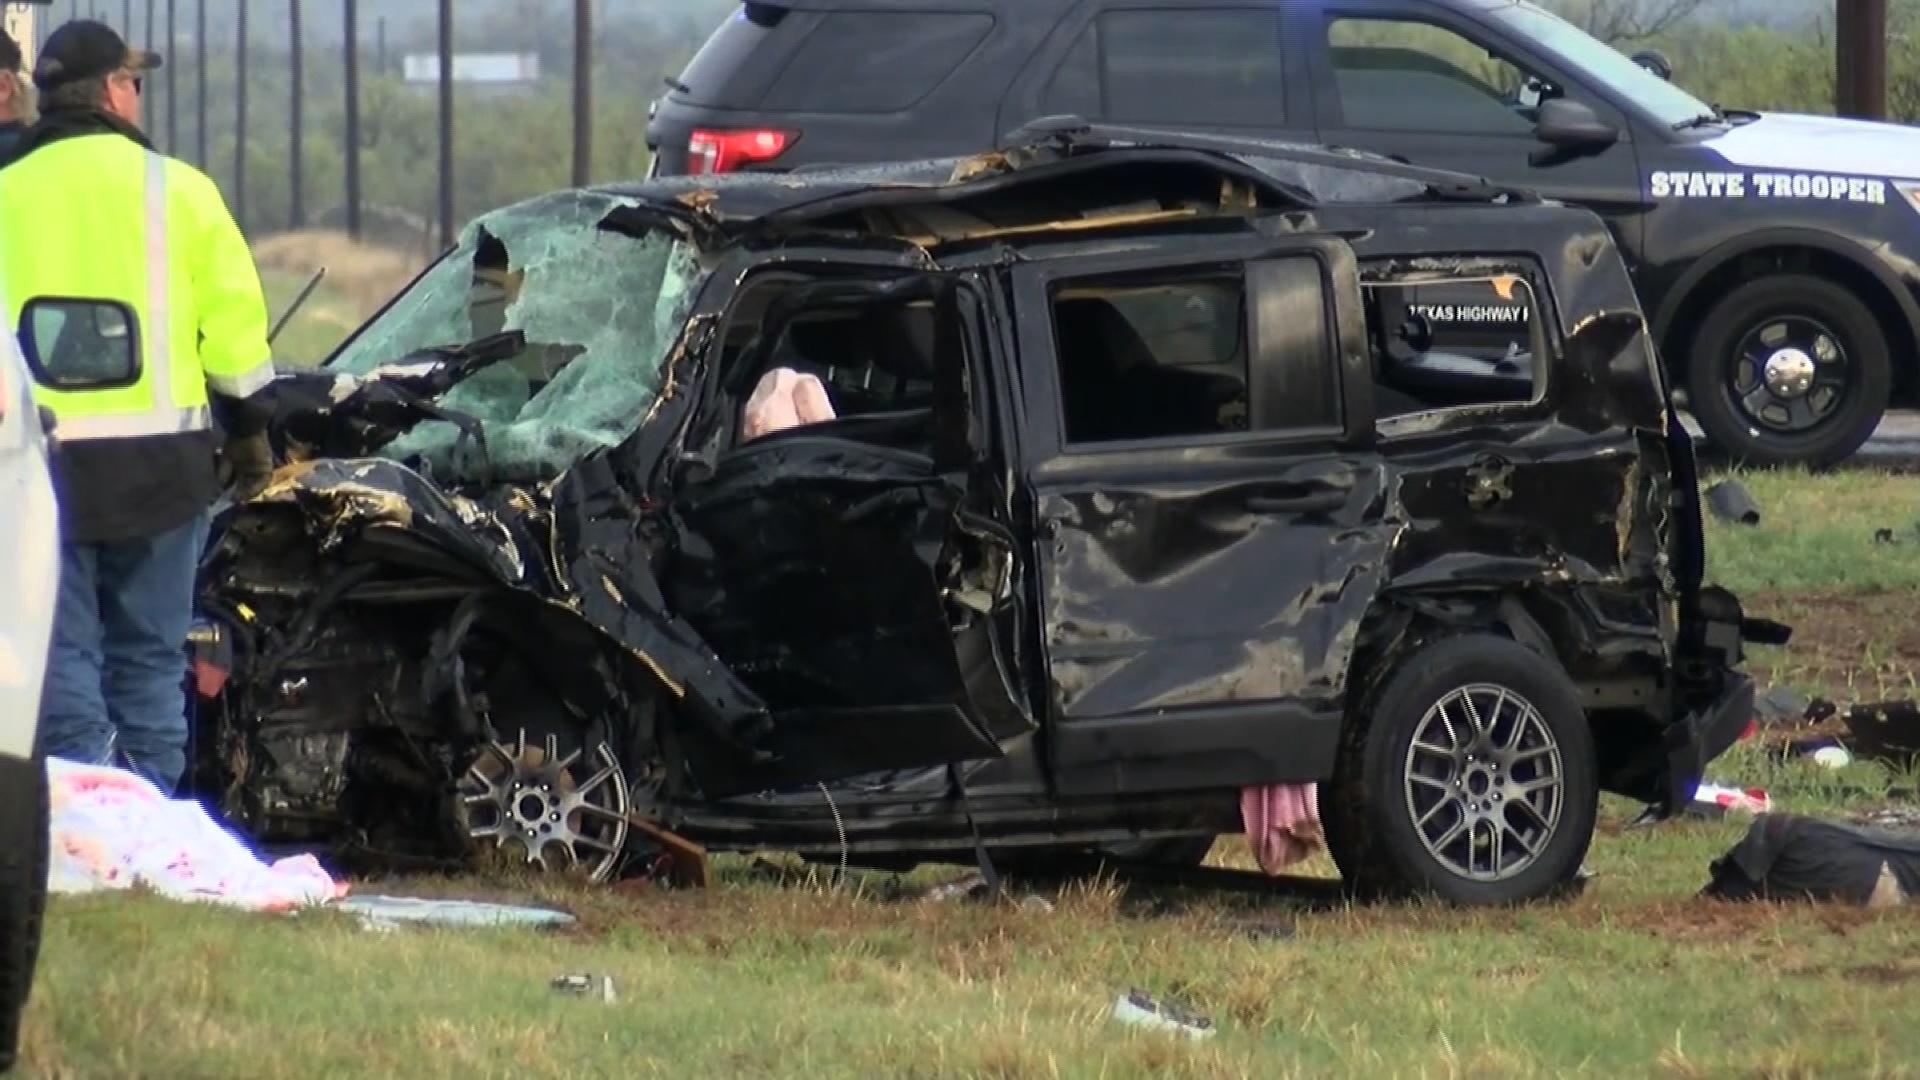 Florida plane crash a death investigation - CNN Video